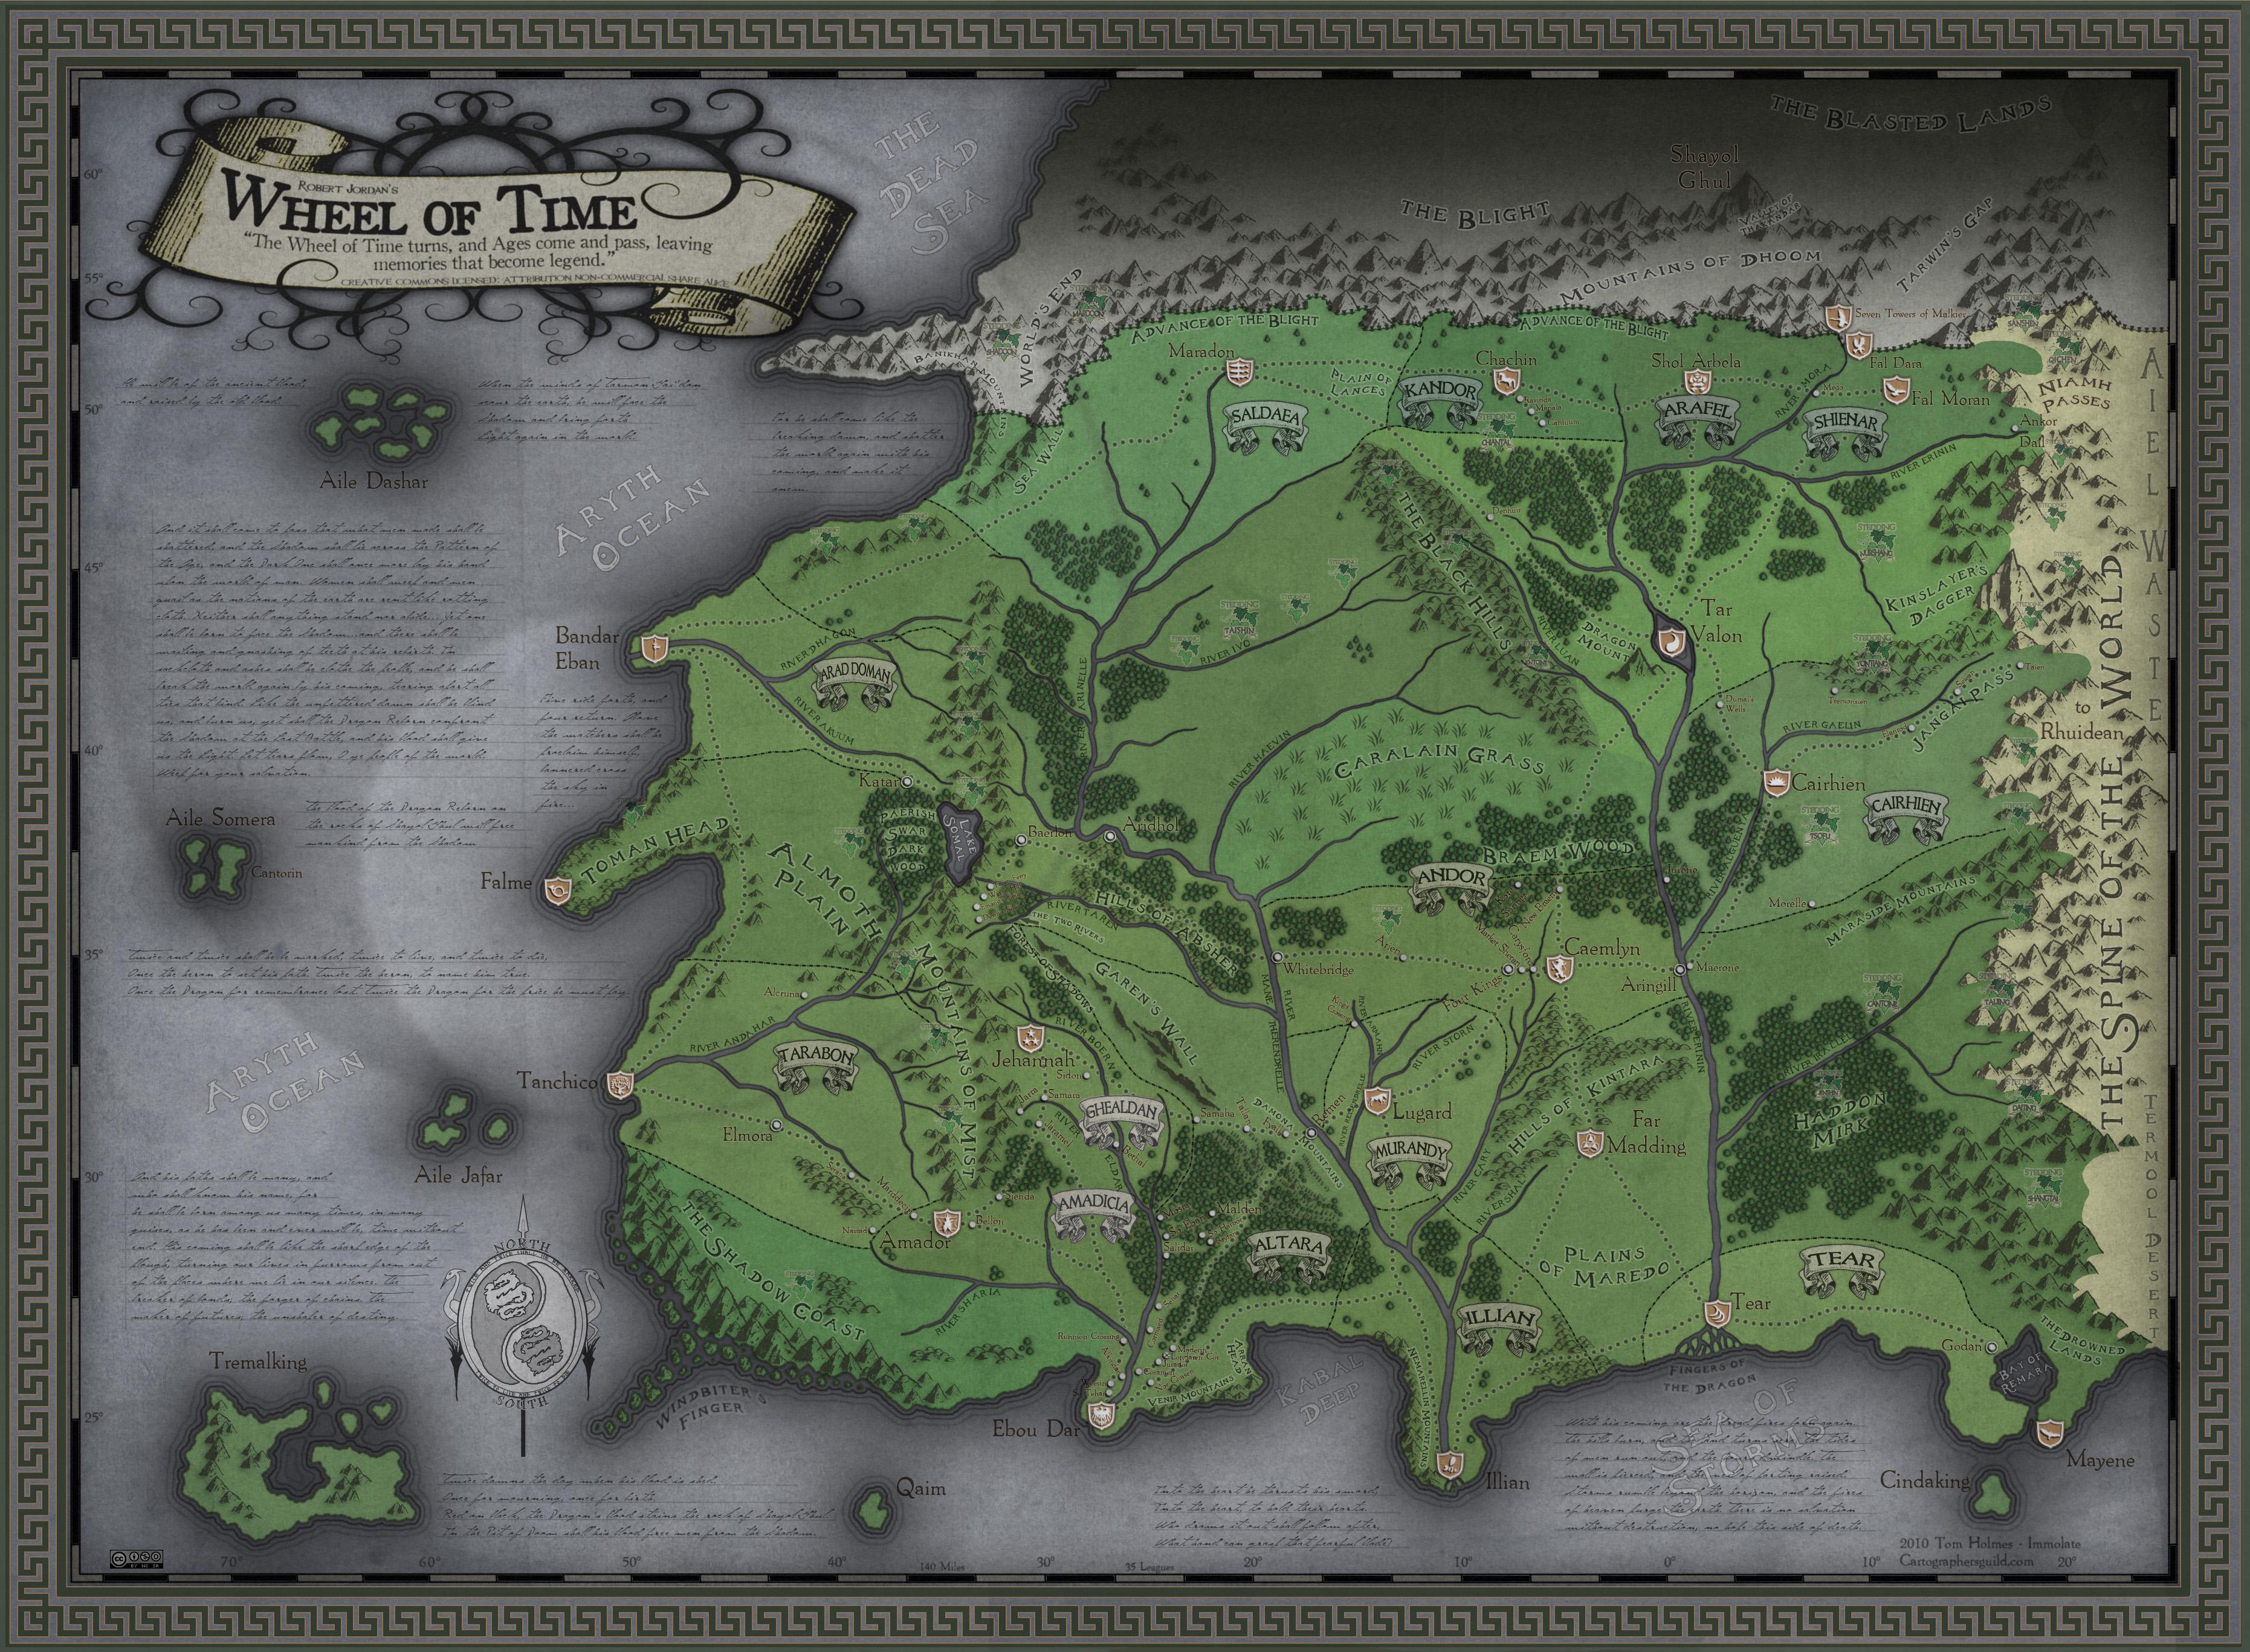 Mapa das Westernlands (fanmade) Wheel_of_Time___Western_Lands_by_SevenBridges